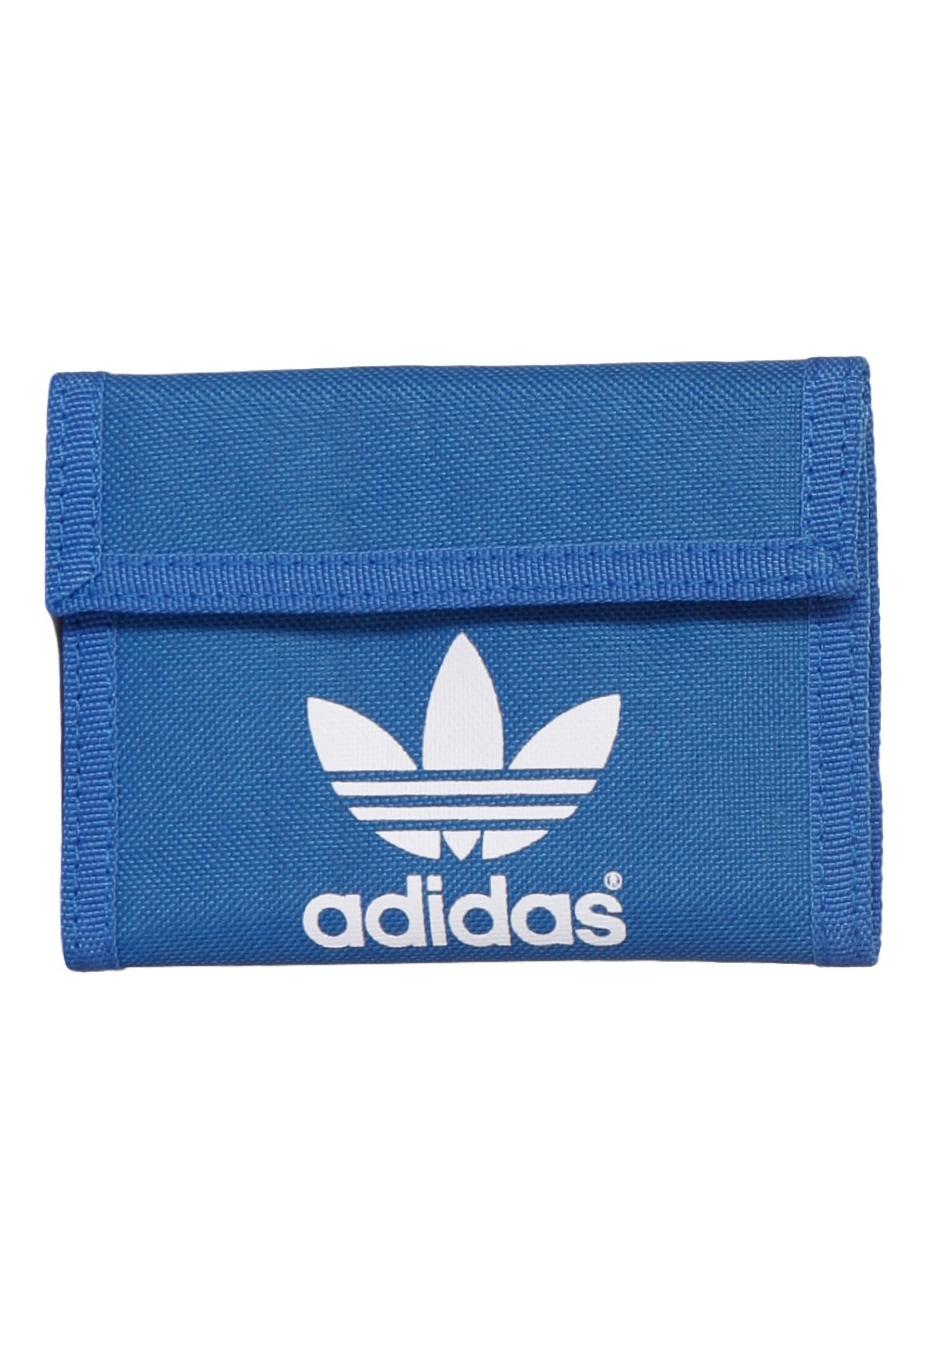 Adidas - Adicolor Prime Blue/White - Wallet - Streetwear